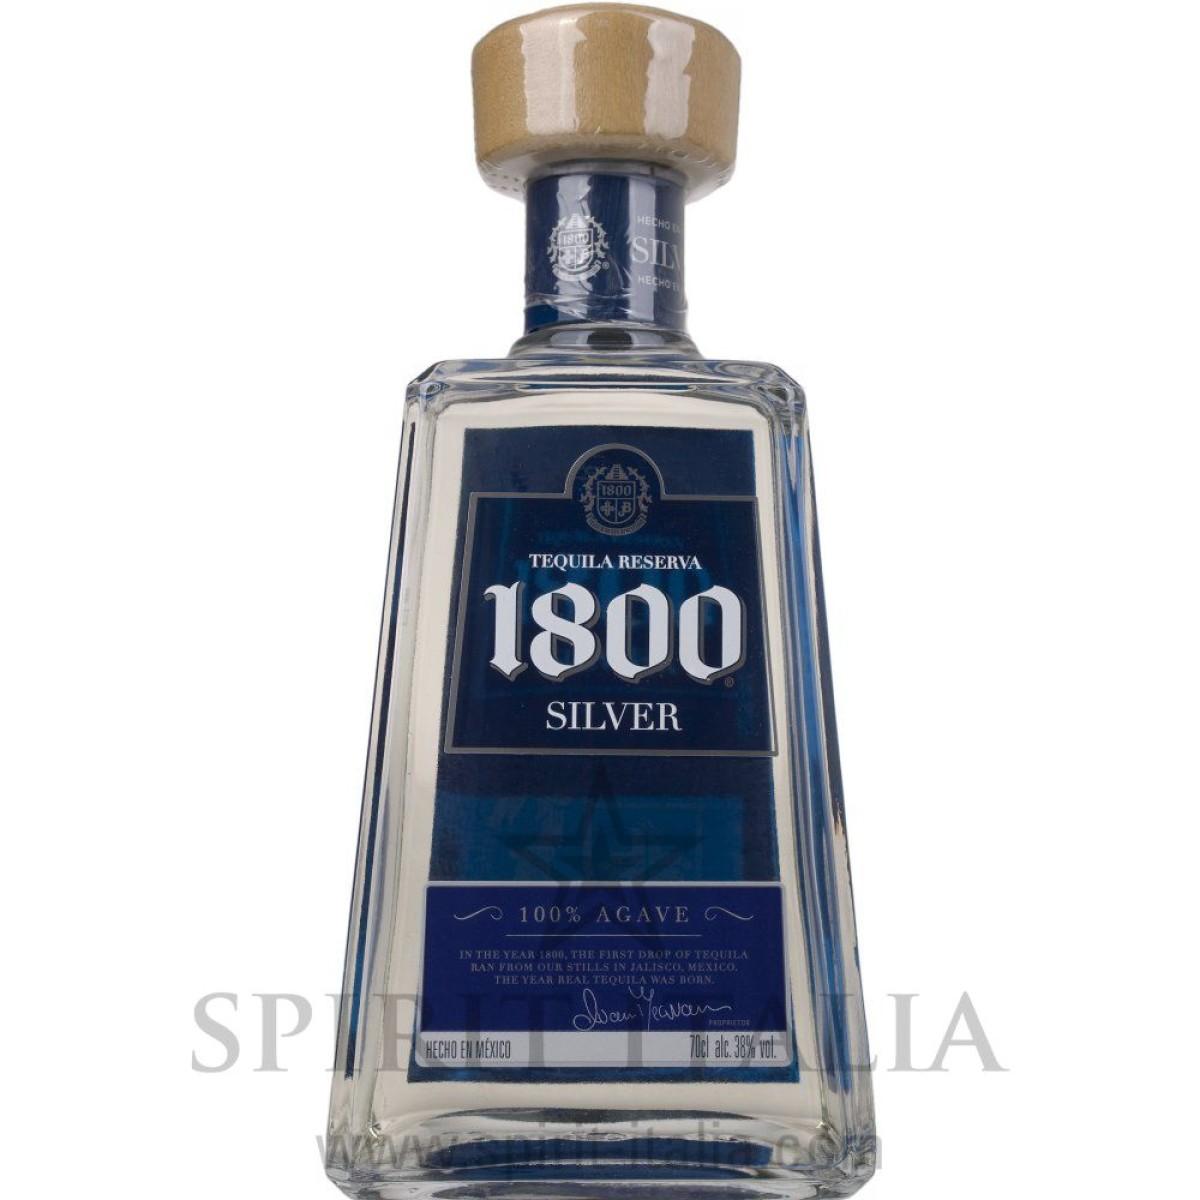 1800 Tequila José Cuervo Silver 100% Agave